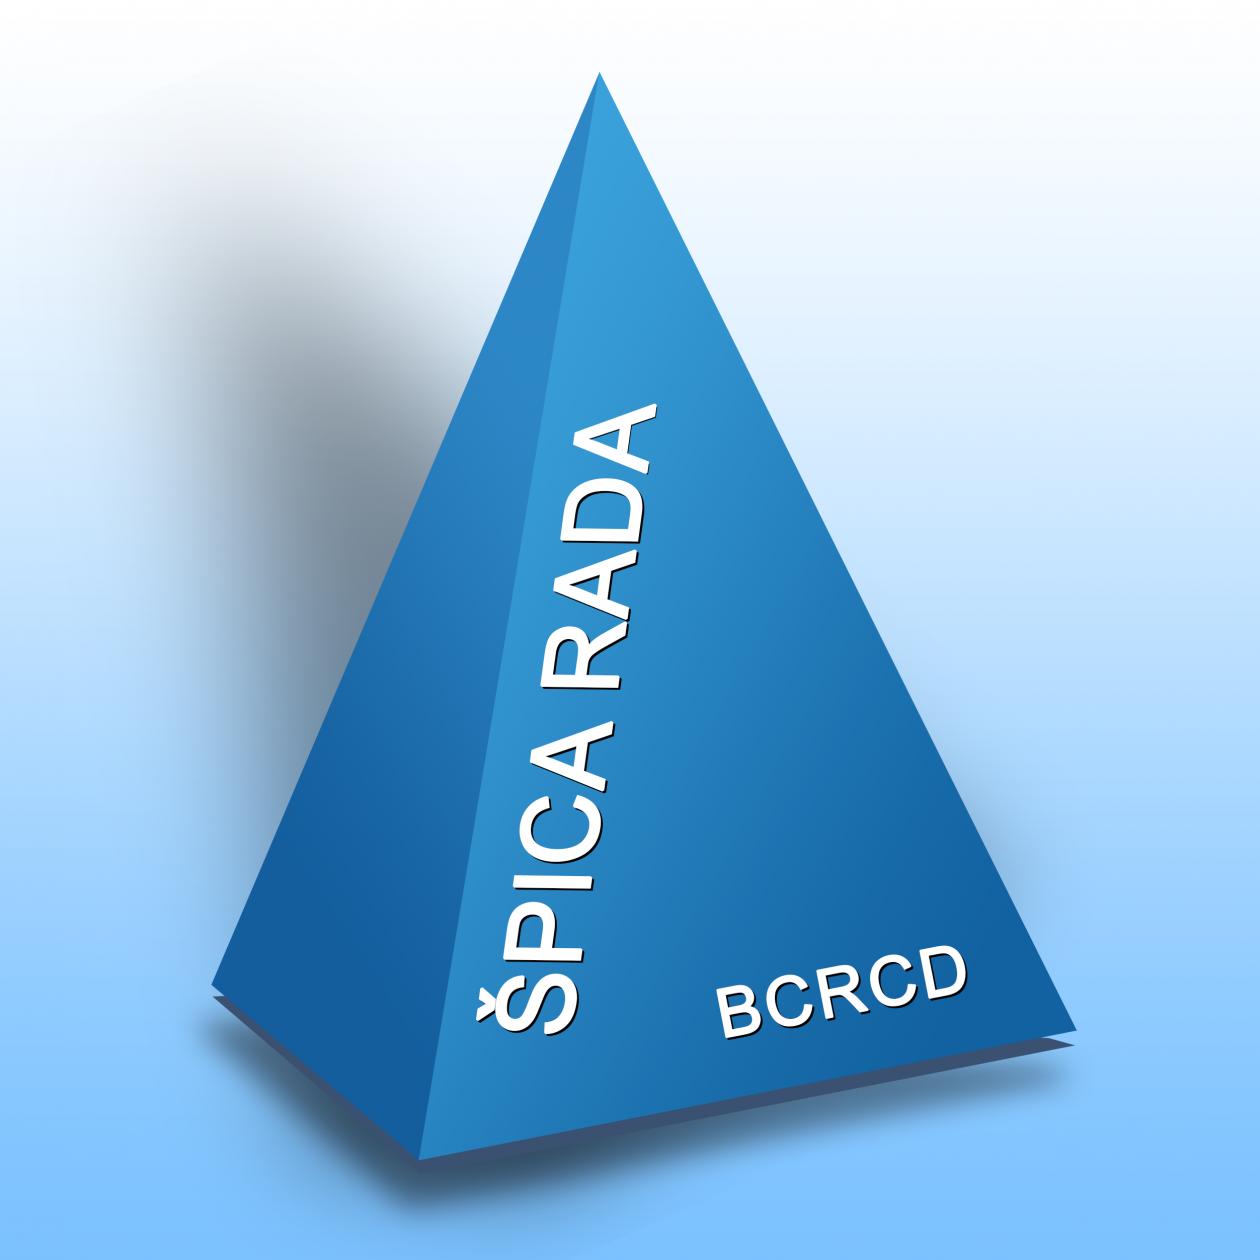 Uspješan završetak još jednog EU projekta BCRCD-a